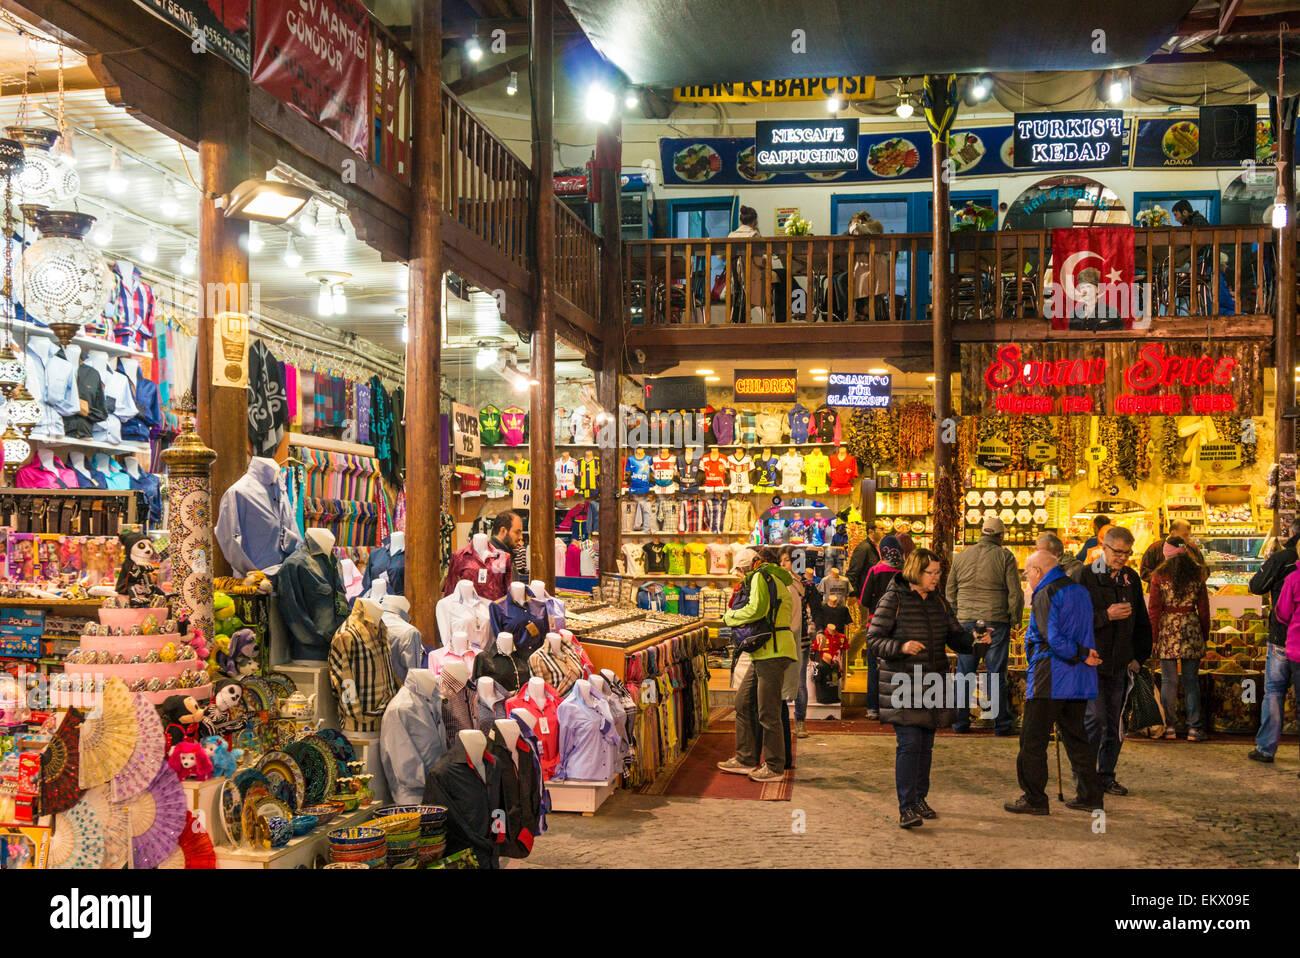 Shopping in the traditional Bazaar or market, Antalya old town, Antalya, Mediterranean Region, Turkey - Stock Image